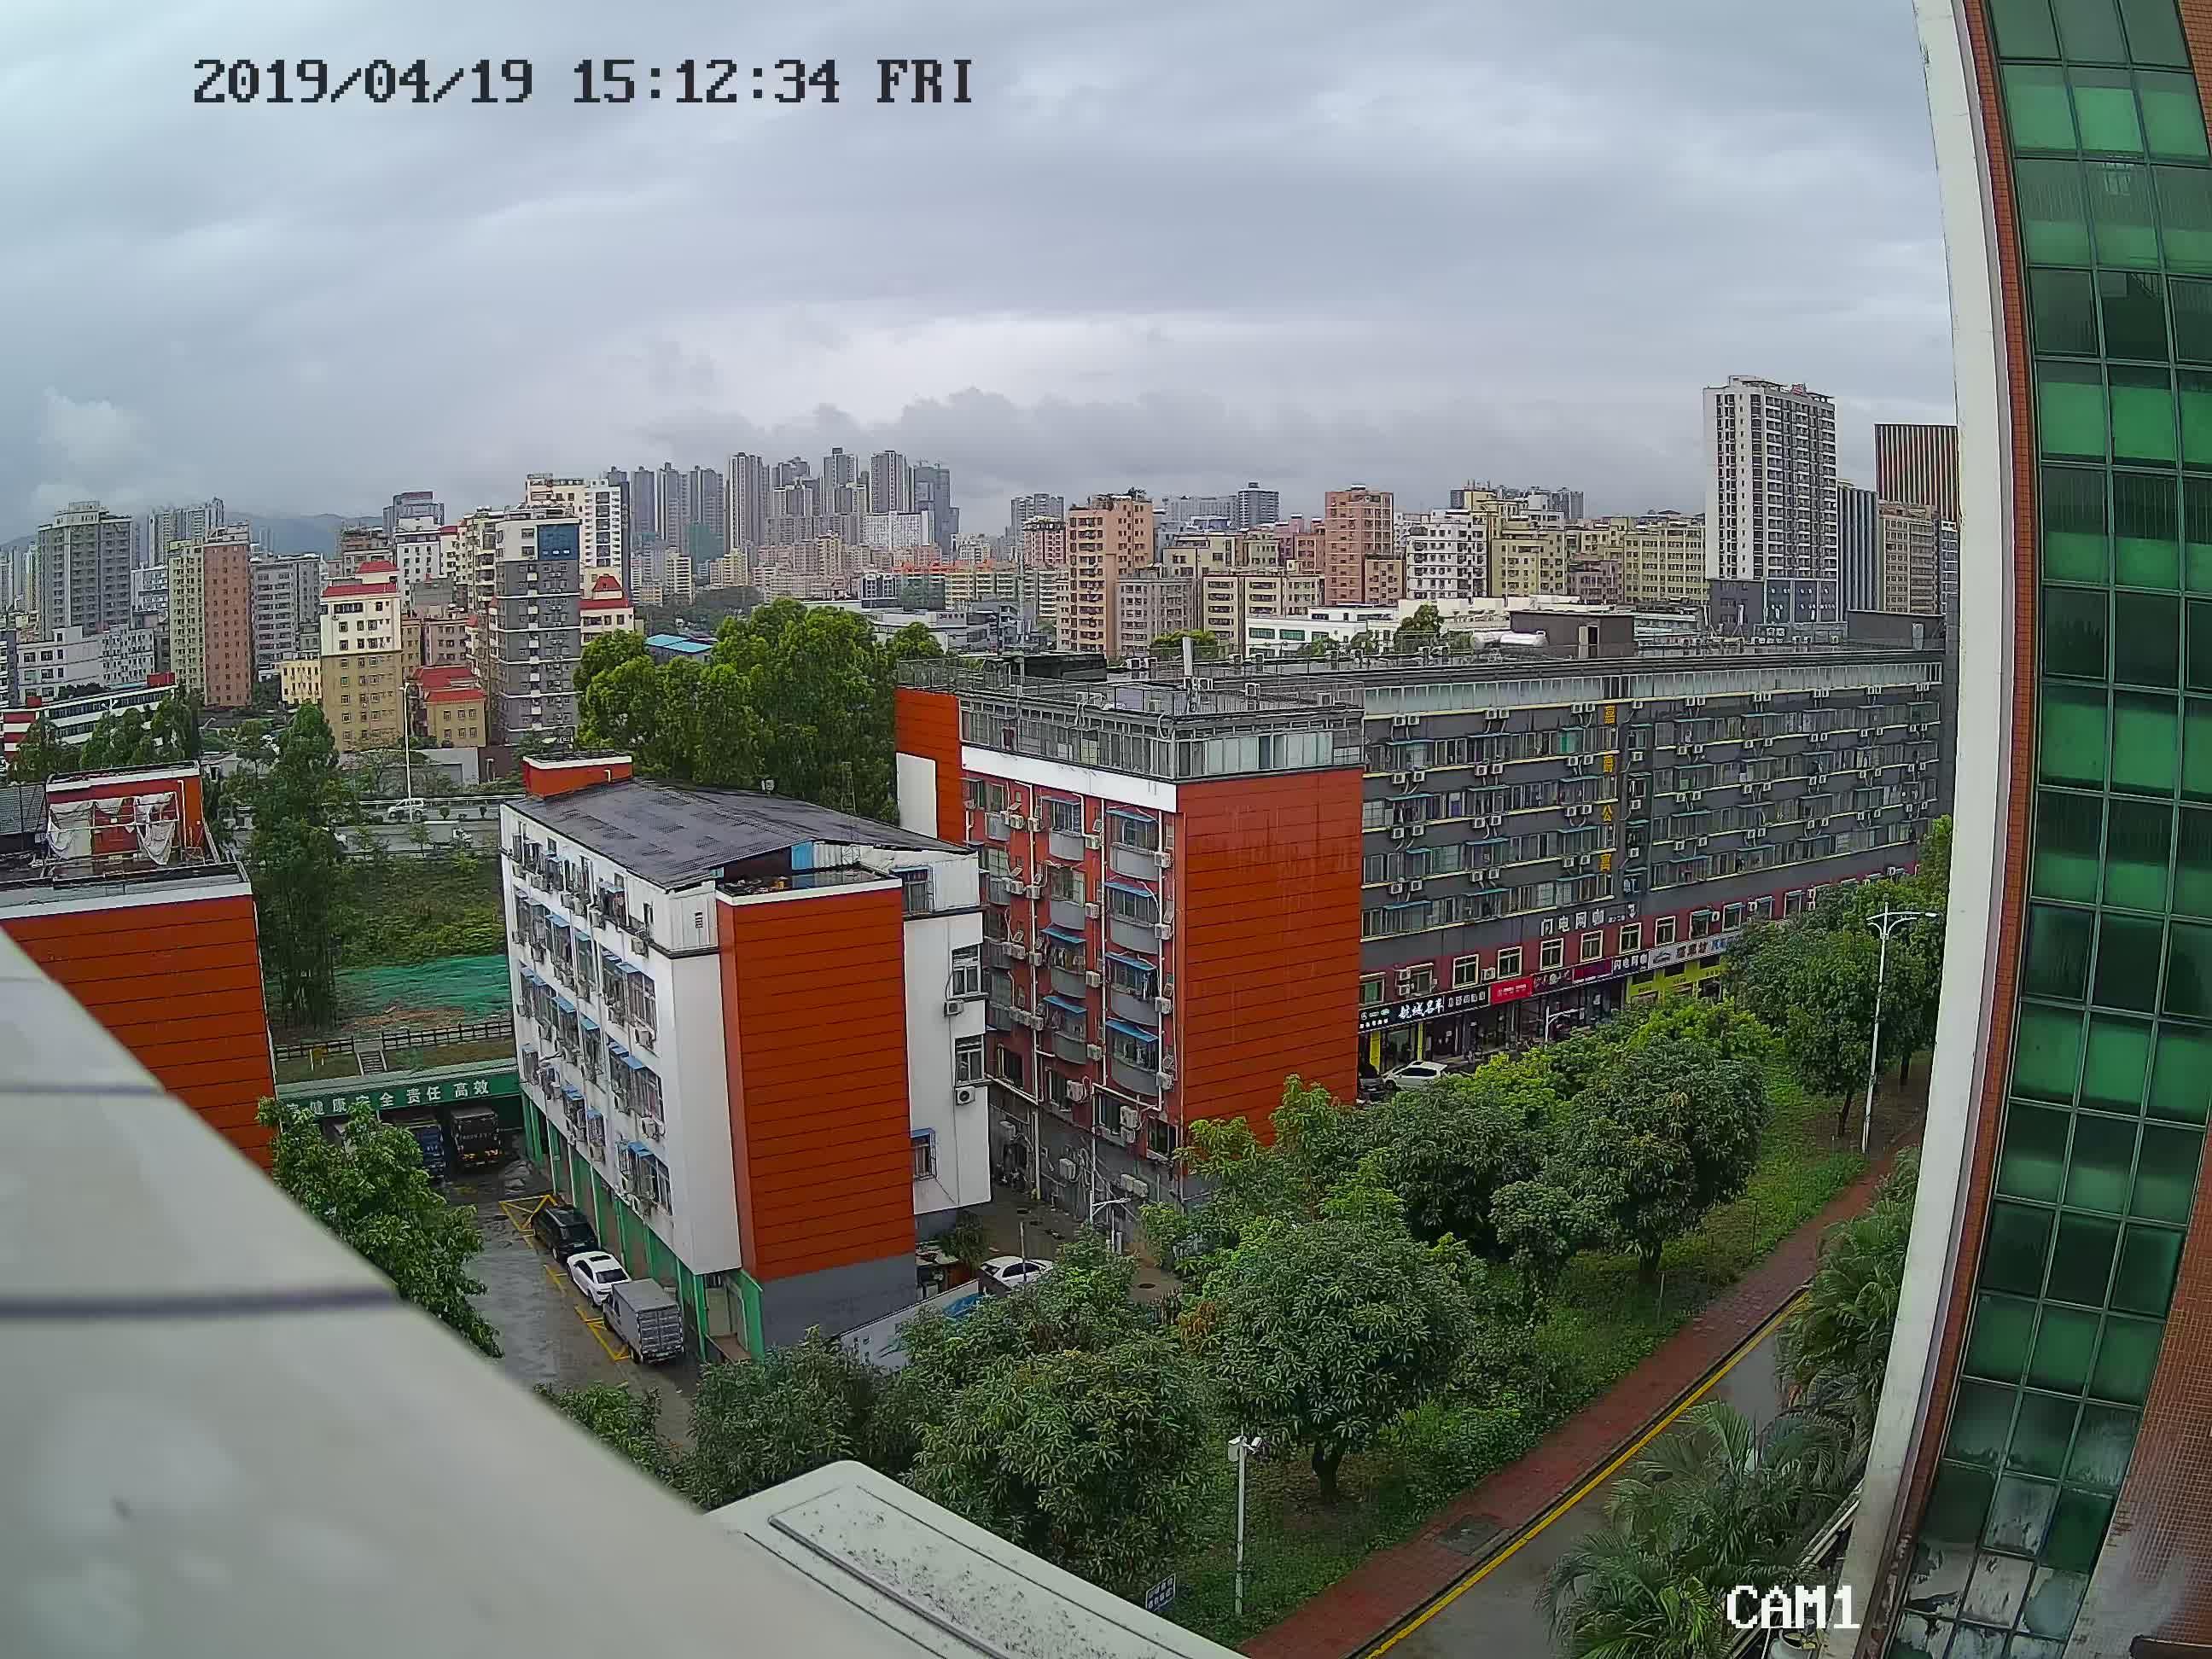 LS VISION عالية الجودة H.265 5MP 4CH في الهواء الطلق الأشعة تحت الحمراء الأمن كاميرا دي فيديو مراقبة مسجل واي فاي كاميرا IP طقم NVR